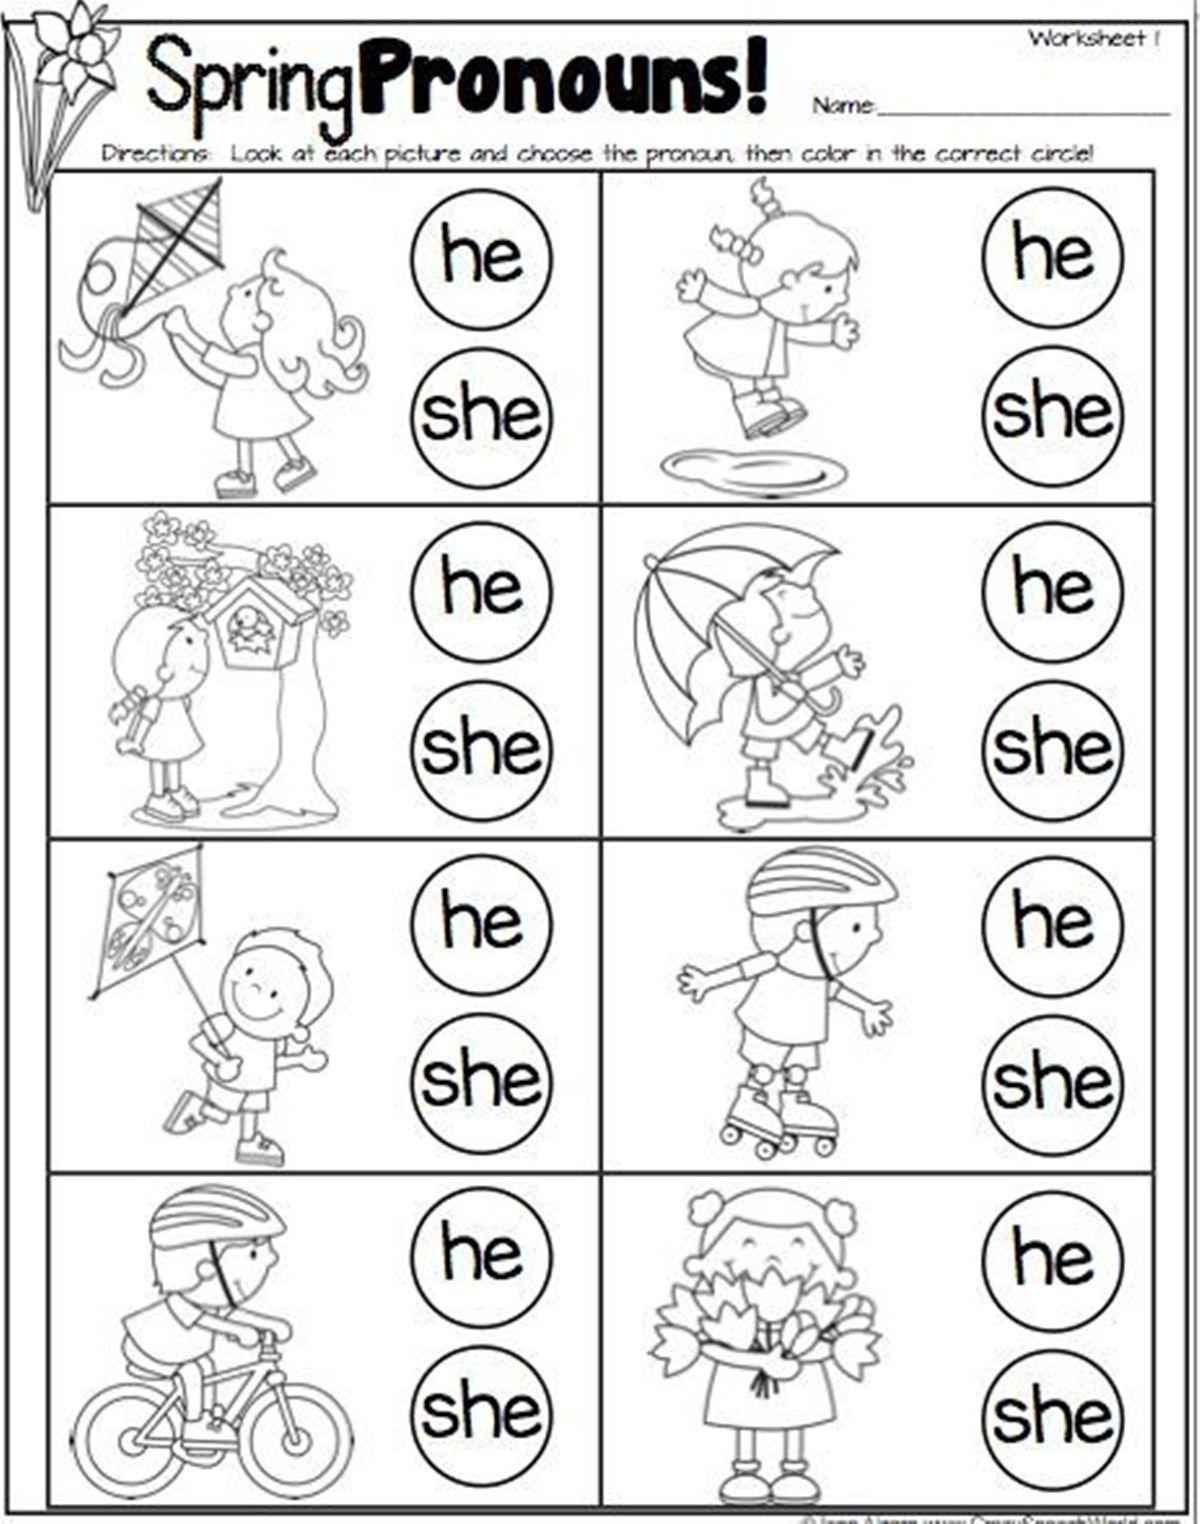 Pronoun In English Spring Speech Therapy Speech And Language Pronoun Worksheets [ 1524 x 1200 Pixel ]